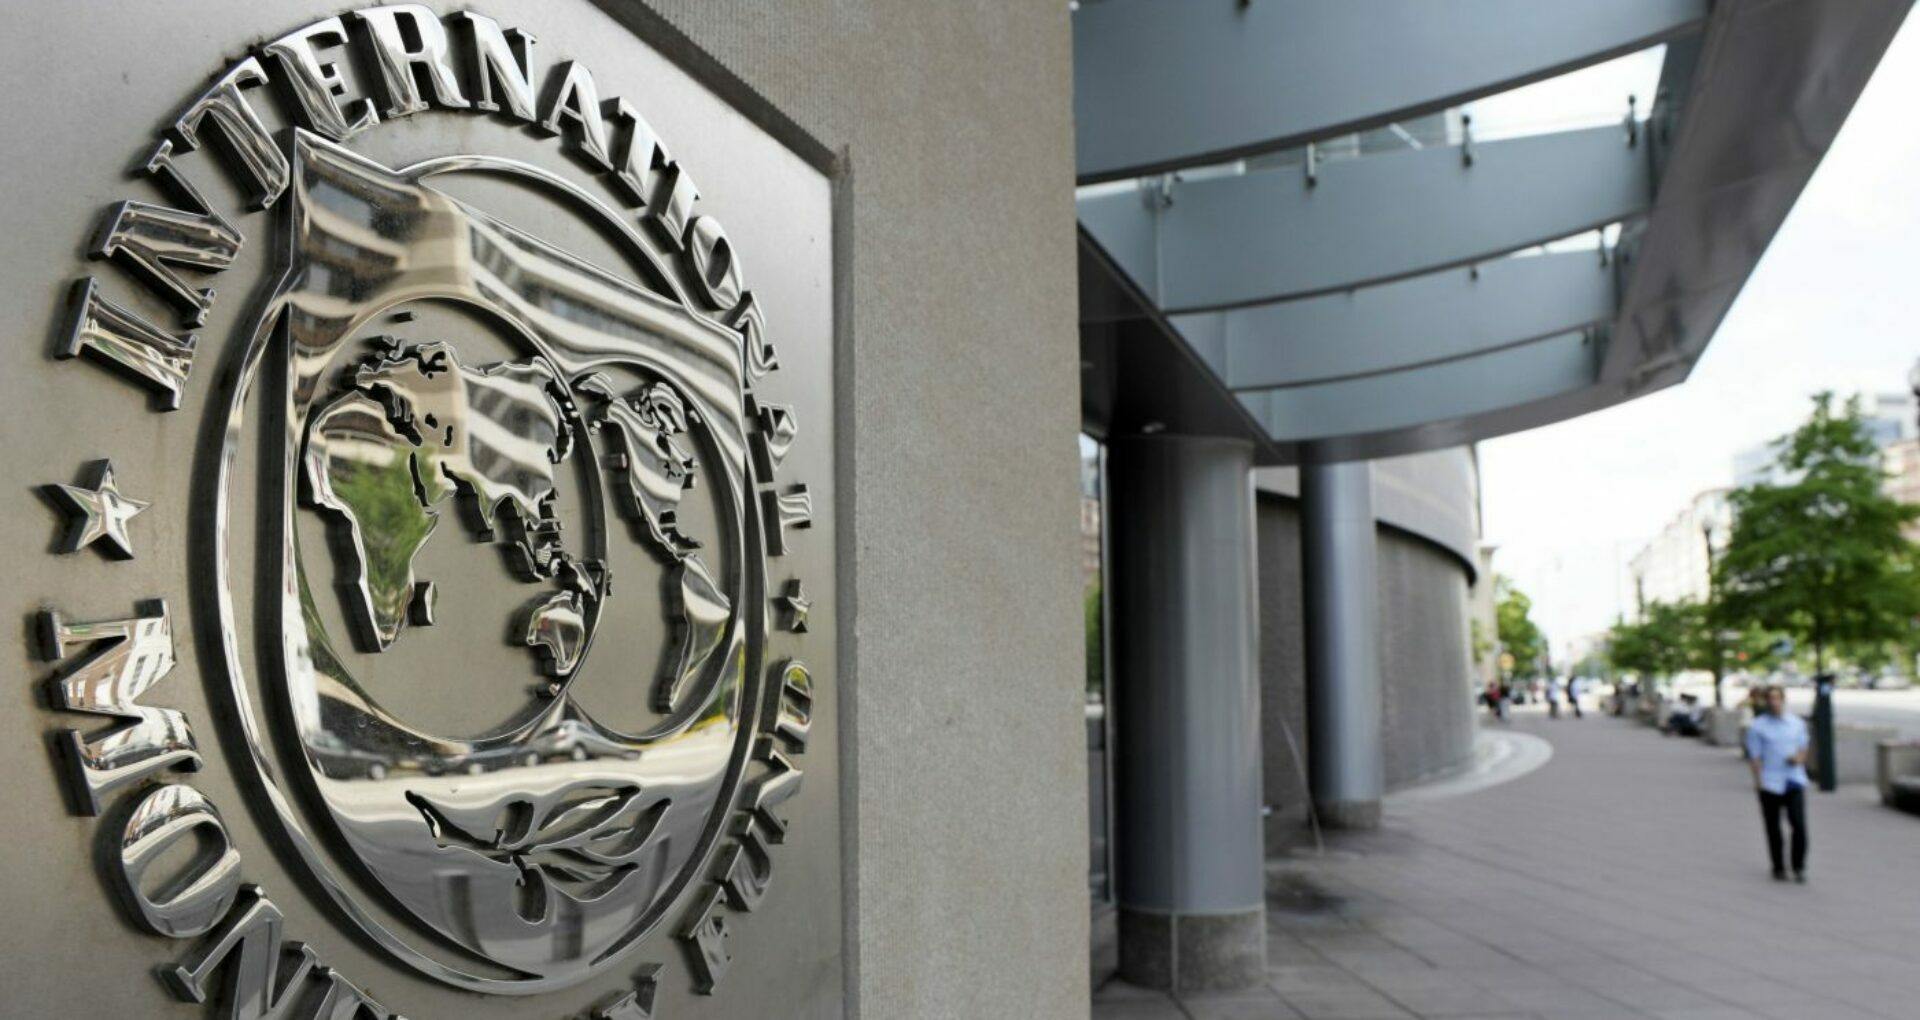 The $235 Million Loan from the International Monetary Fund Reaches Moldova